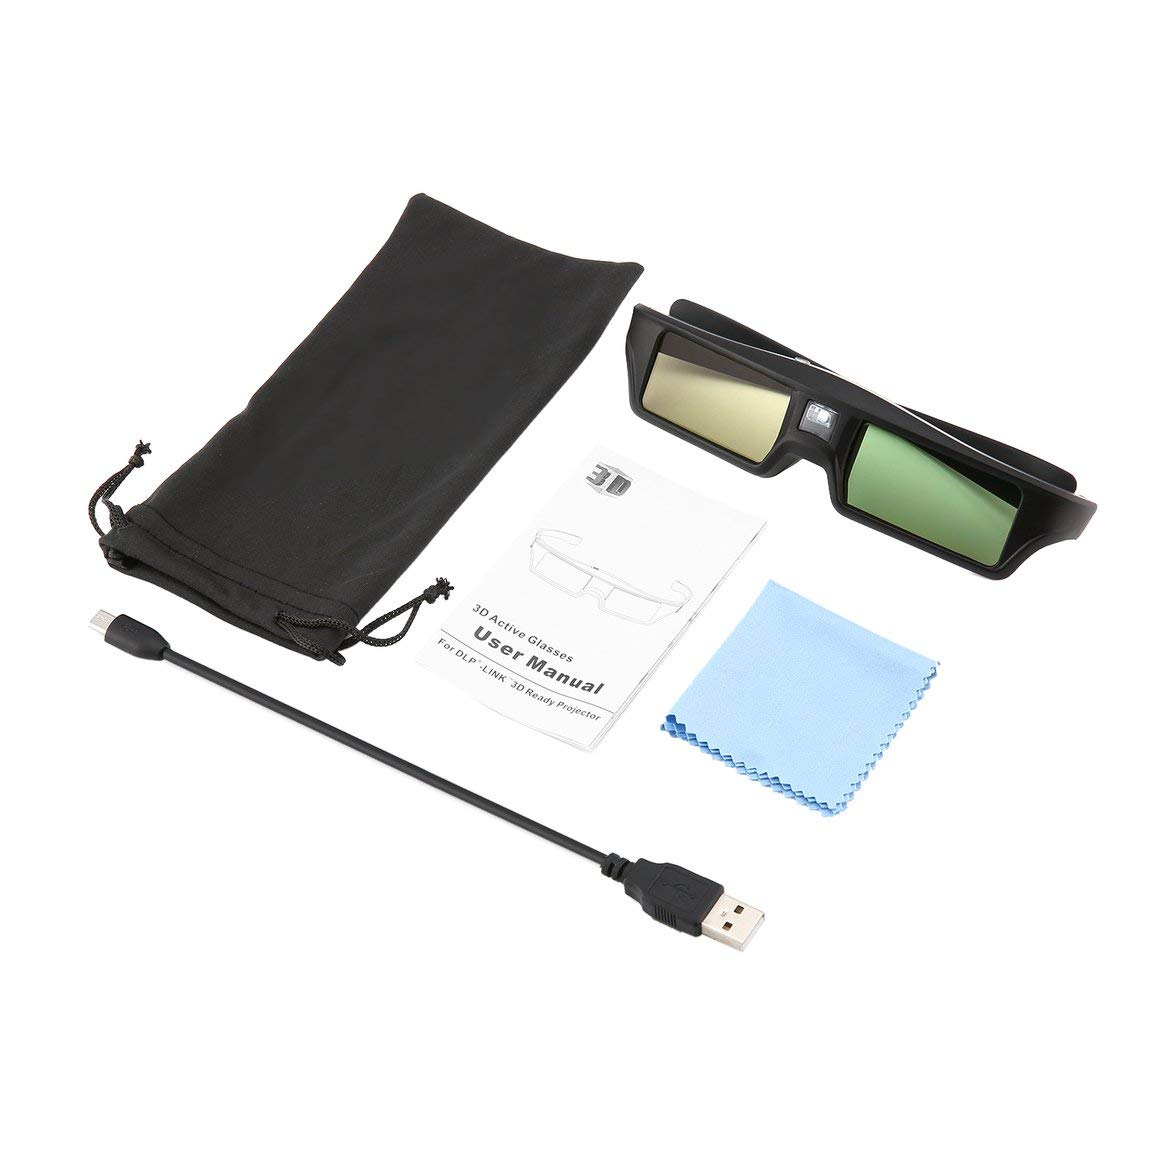 Gafas Active Shutter para proyector BenQ W1070 W700 W710ST DLP ...